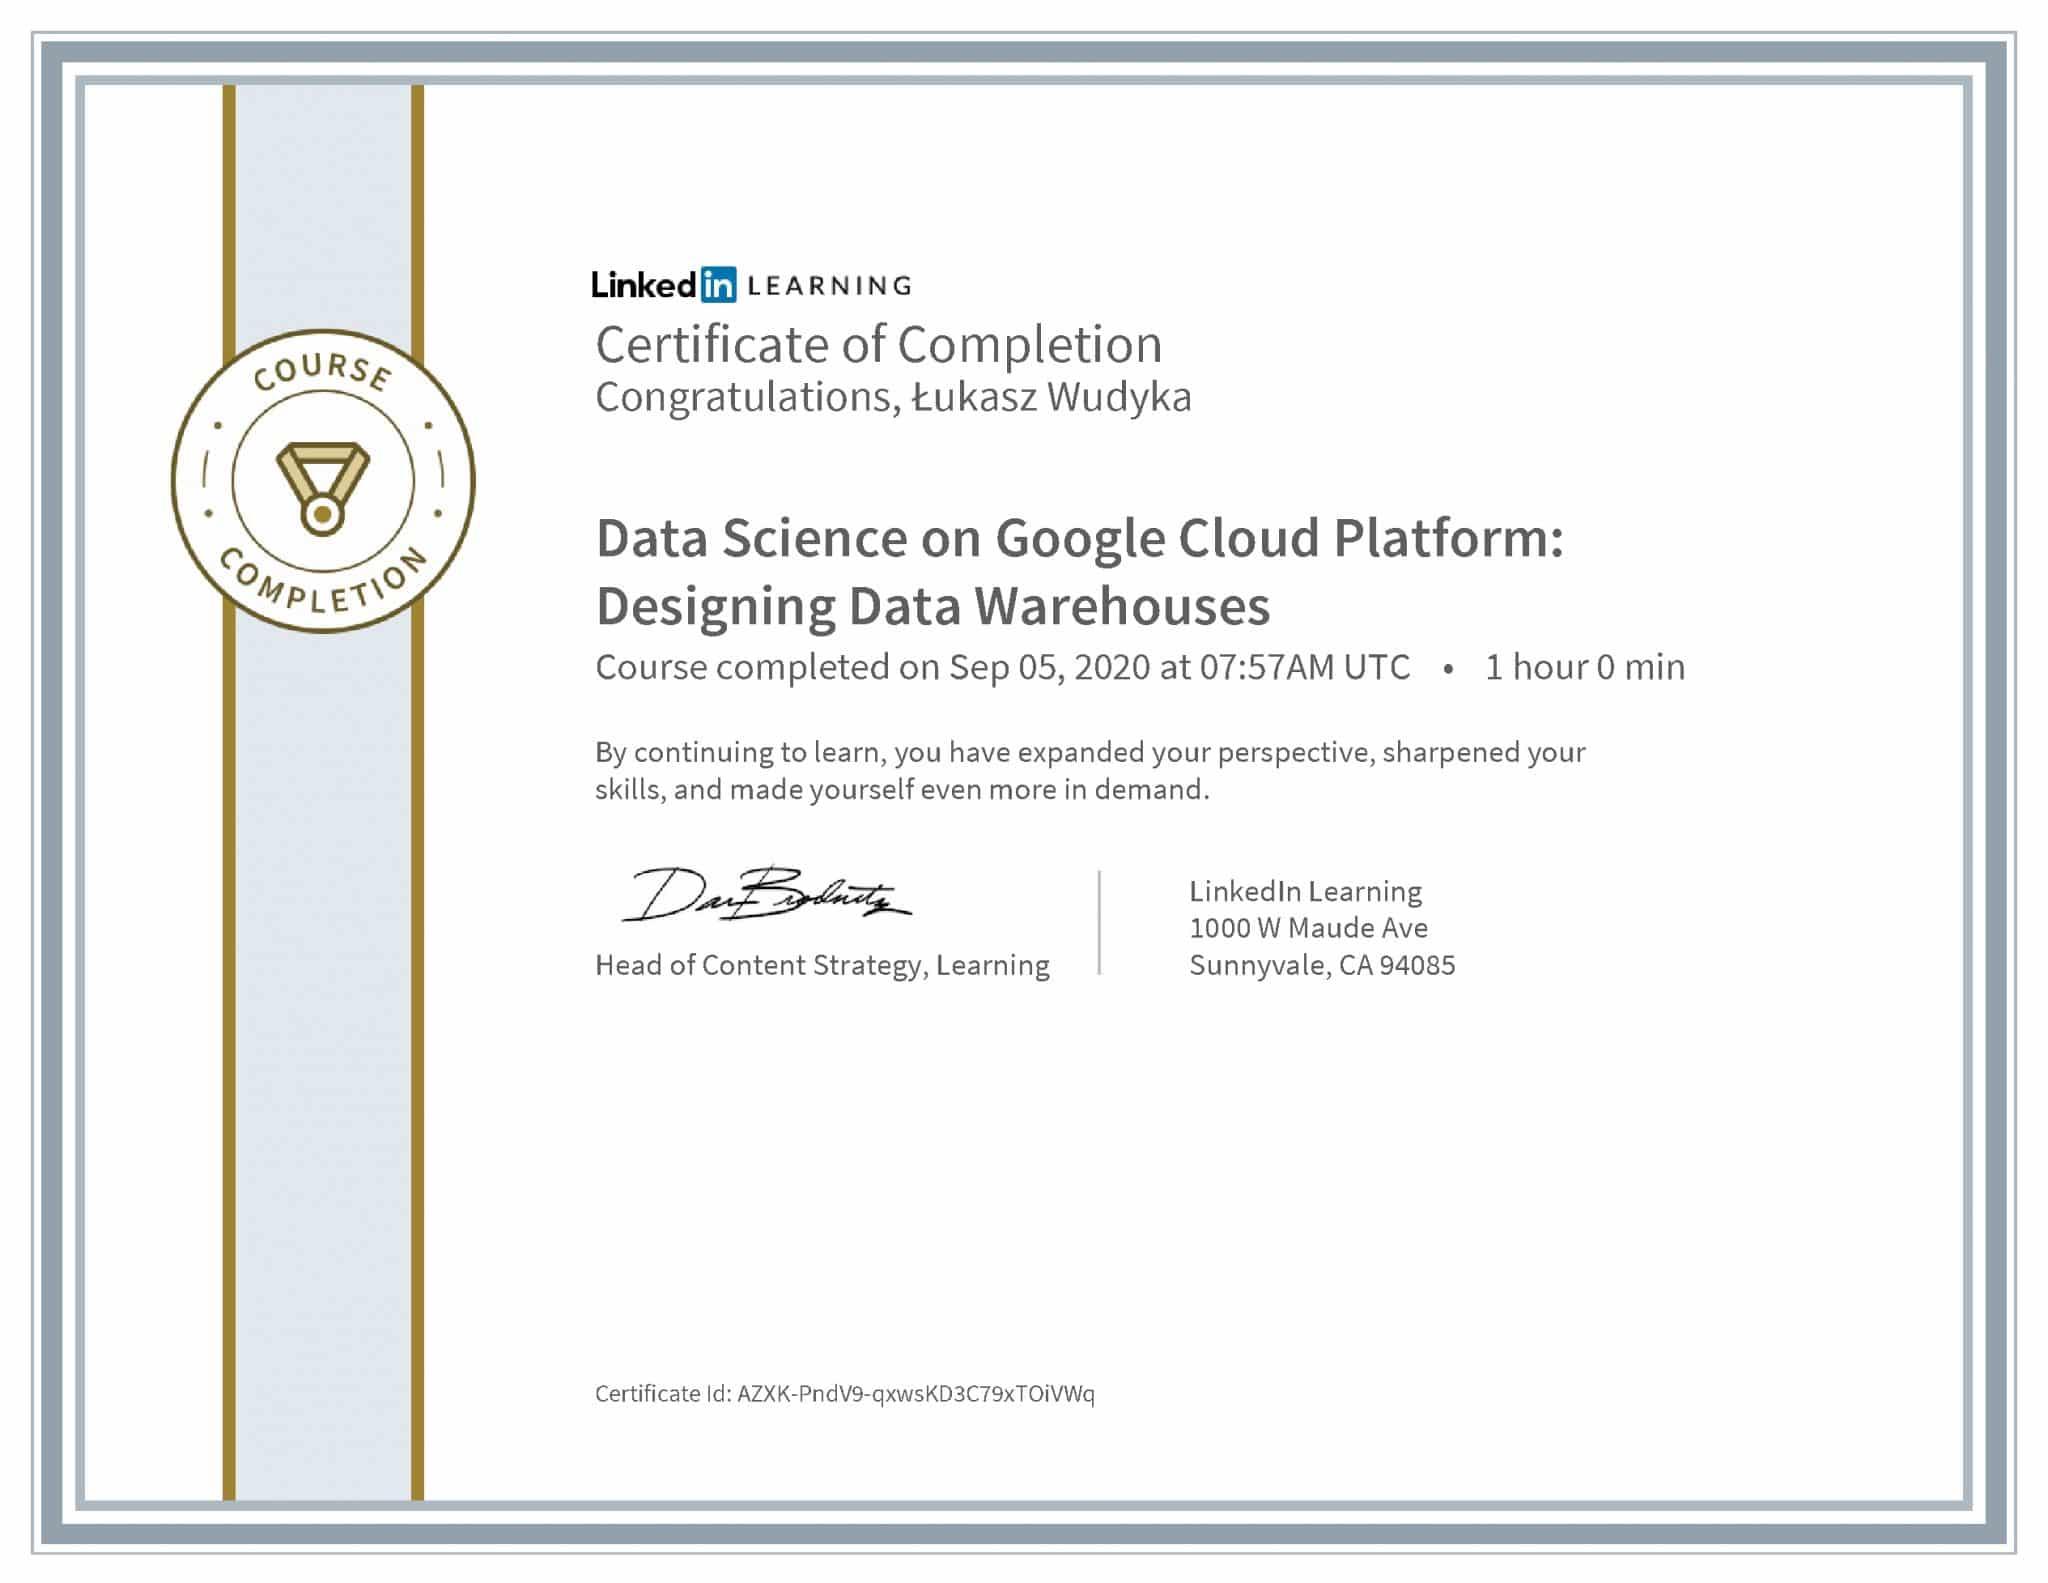 Łukasz Wudyka certyfikat LinkedIn Data Science on Google Cloud Platform: Designing Data Warehouses